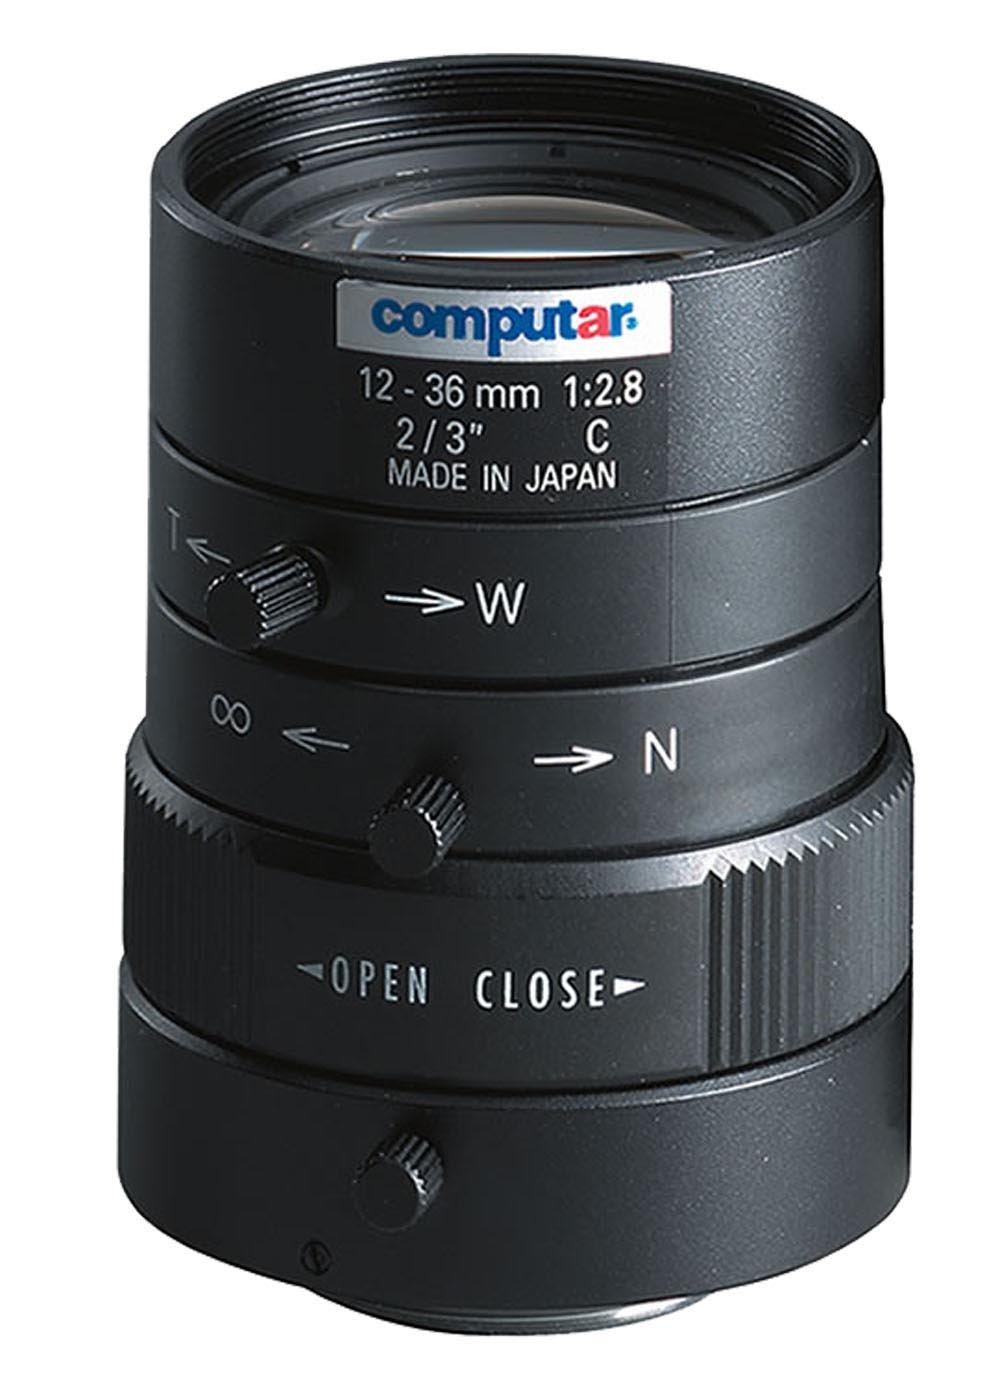 Computar M3Z1228C-MP 0.66-Inch 1.3 Megapixel Varifocal lens 12-36mm F2.8 Manual Iris by Computar